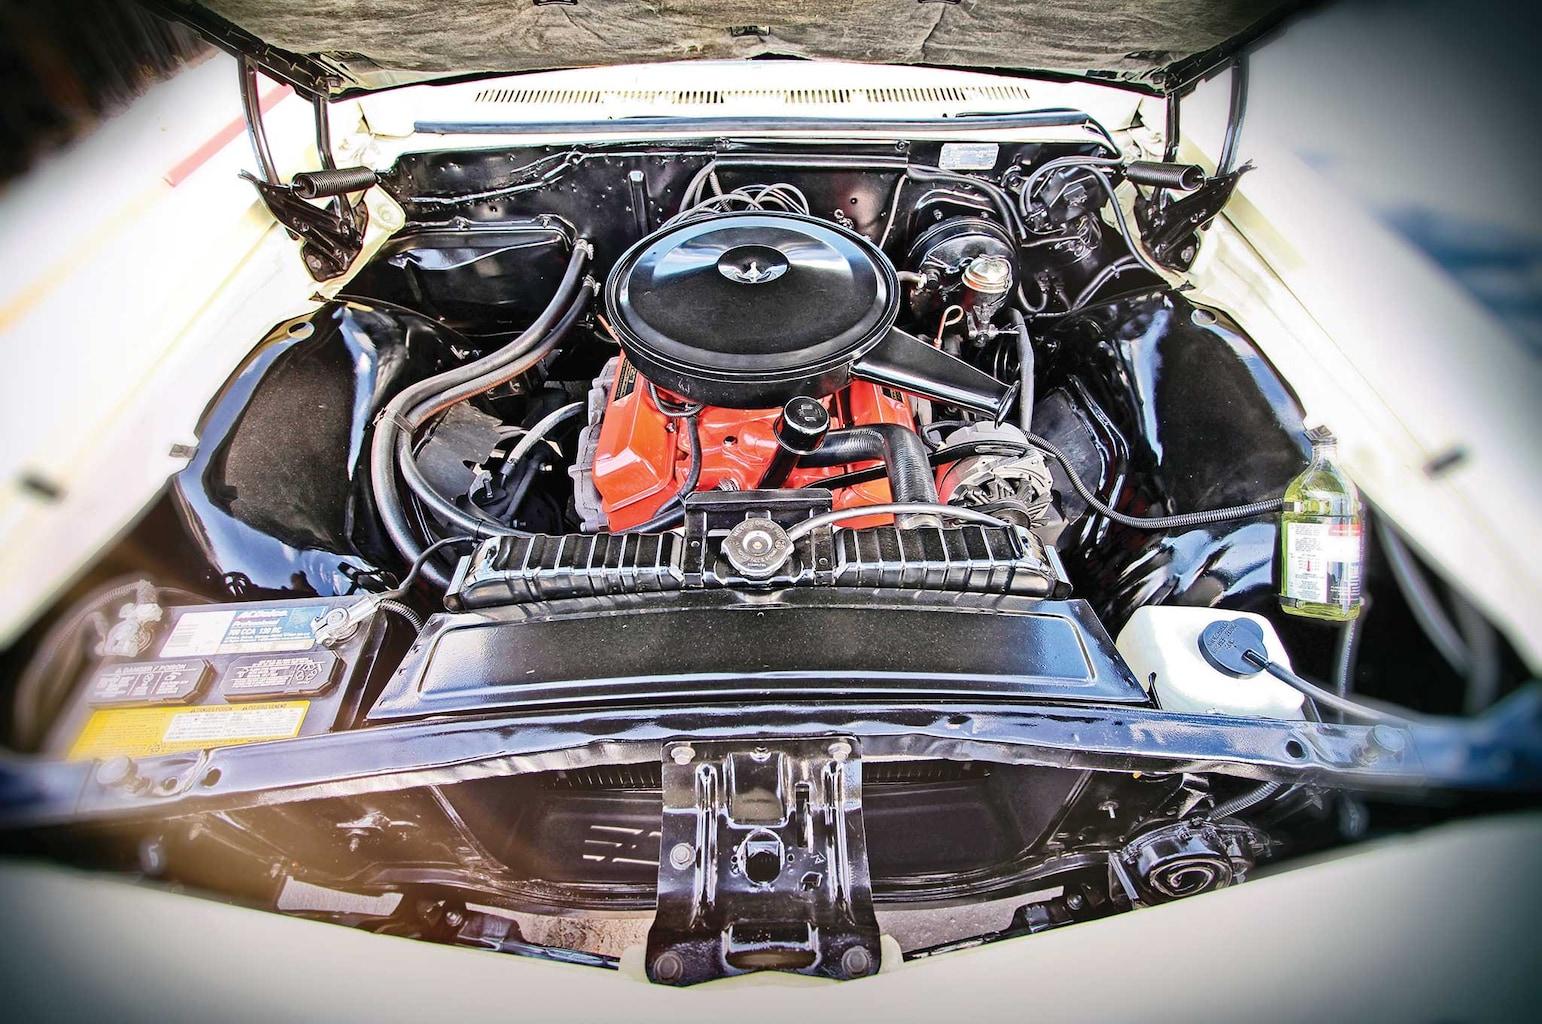 1966 chevrolet caprice 327 cid engine 003